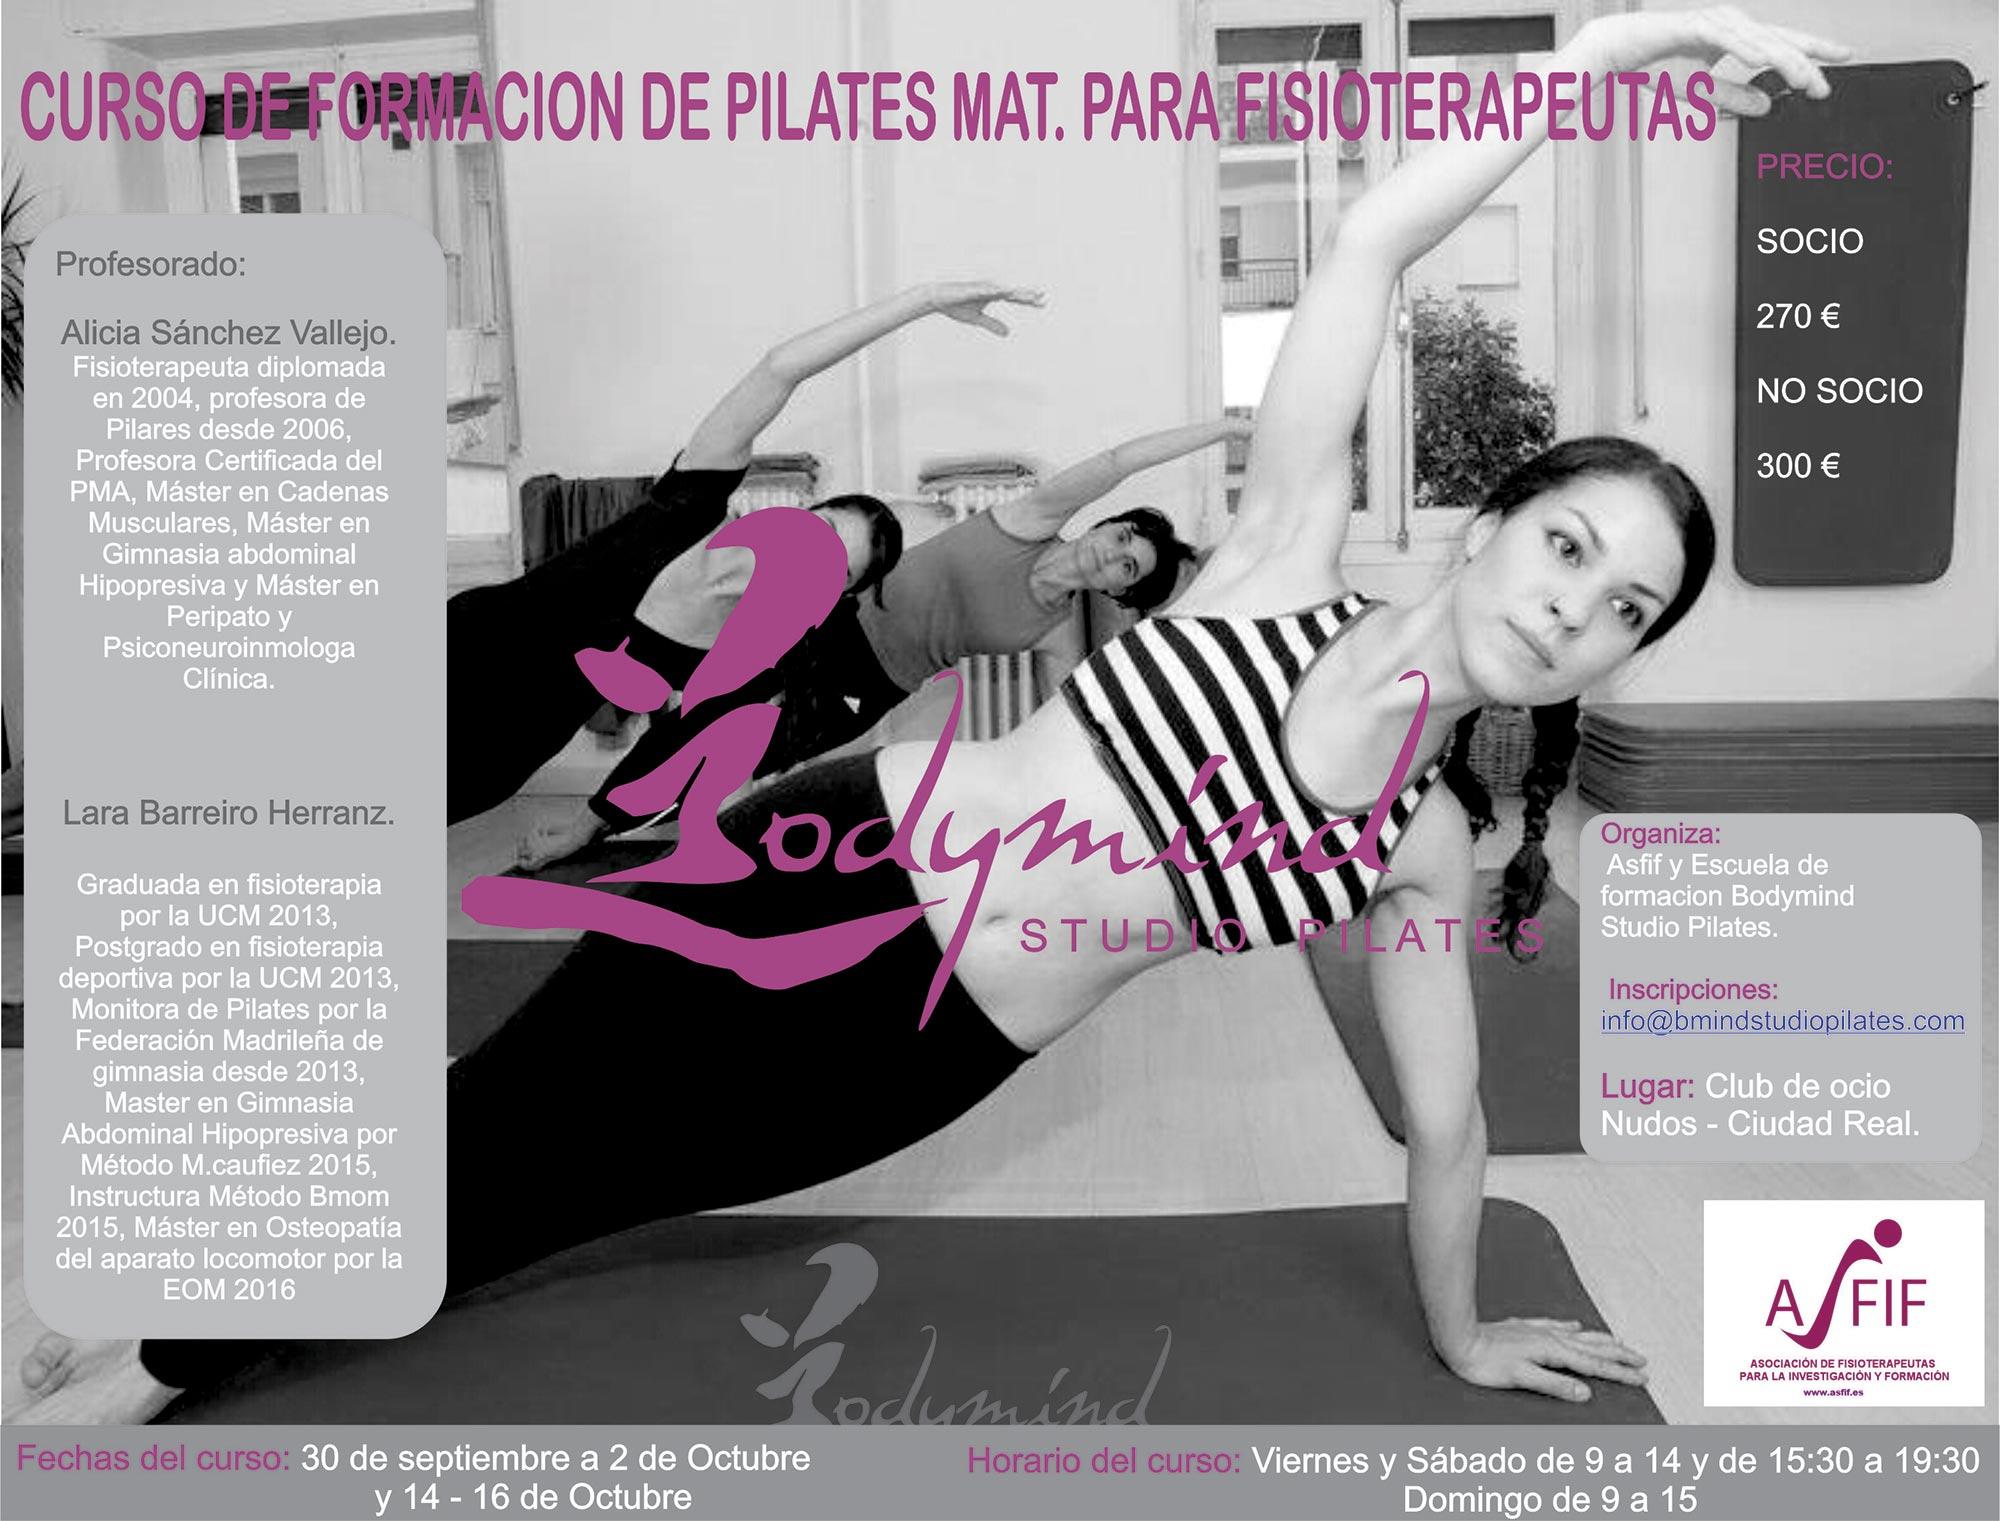 curso de formacion de pilates mat. para fisioterapeutas Bodymind Studio